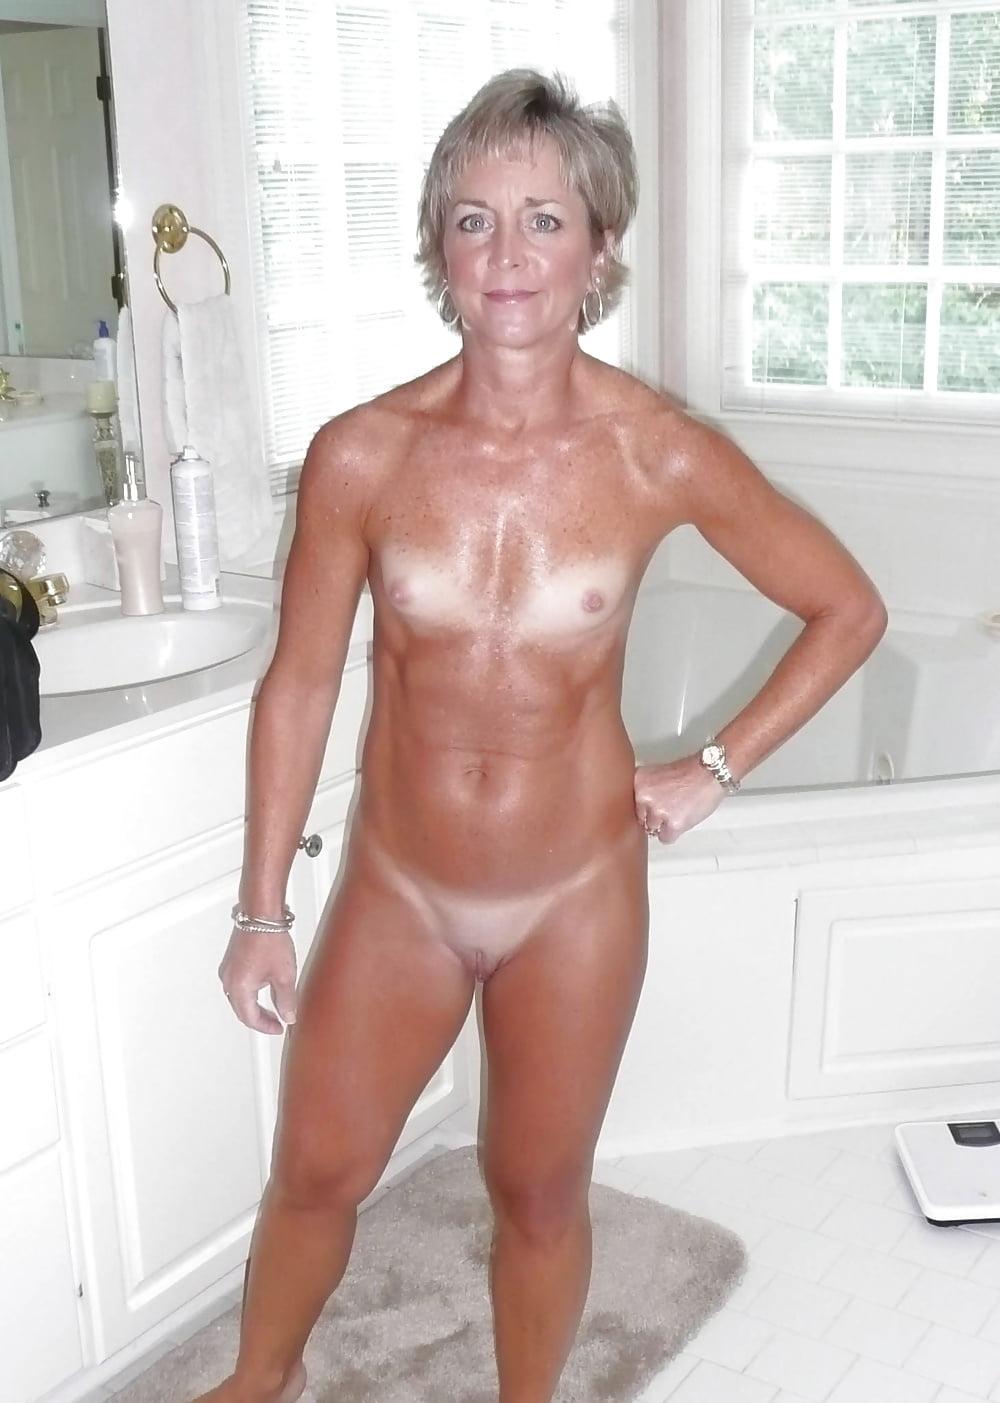 indian-mature-amateur-slim-nude-bilder